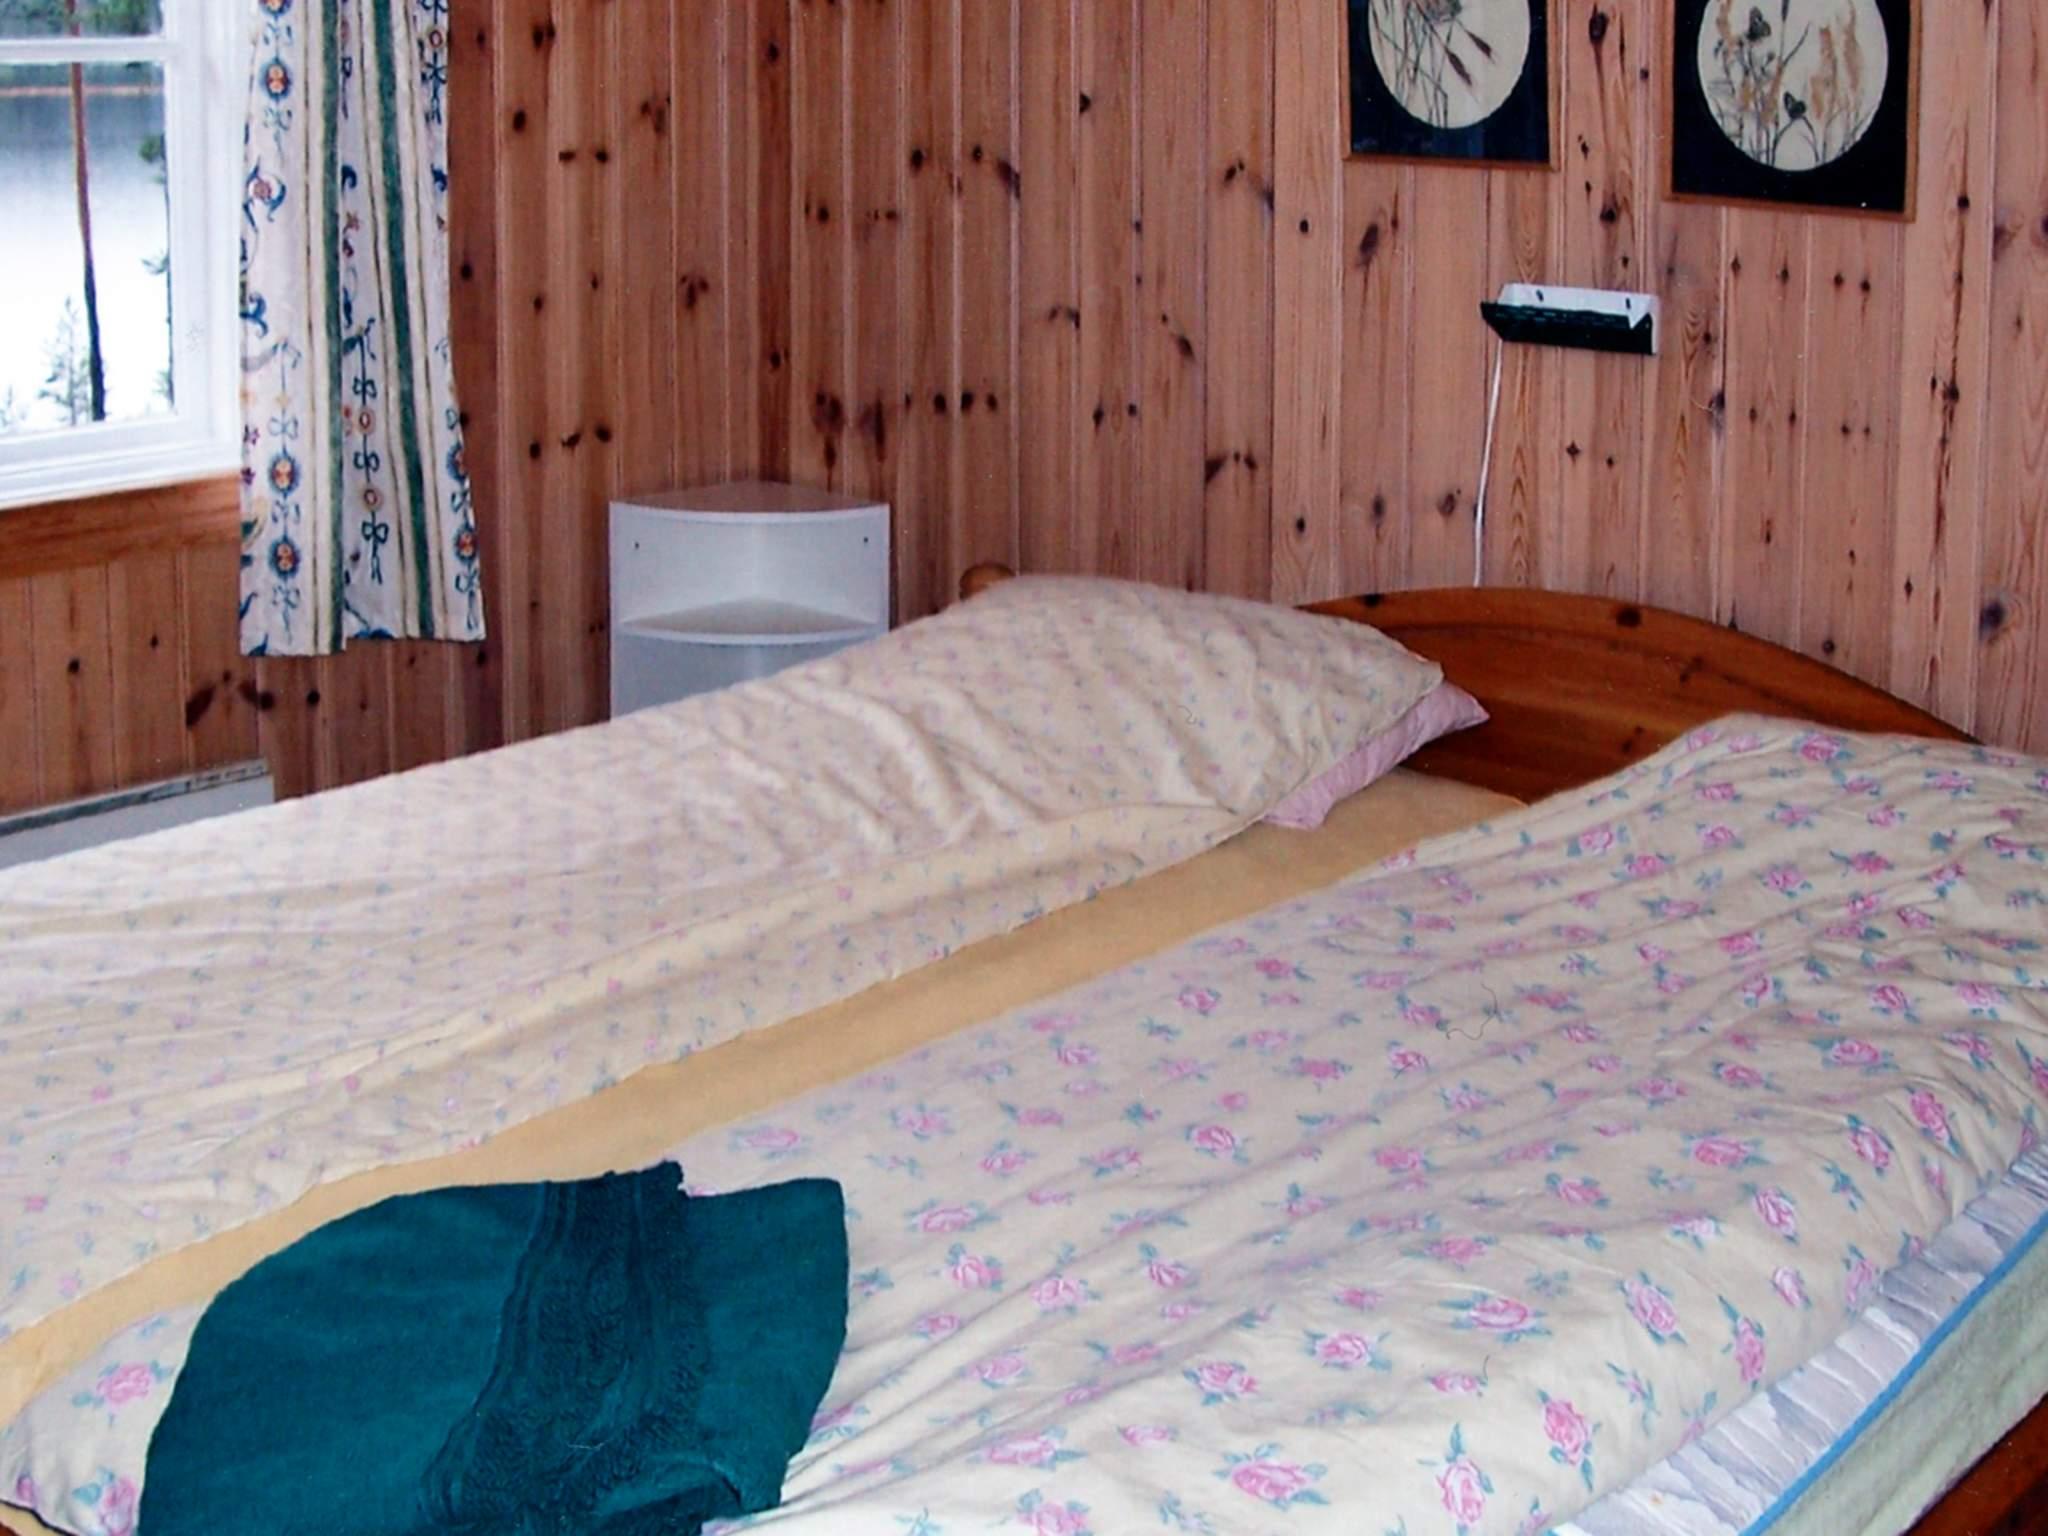 Ferienhaus Eikhom (85017), Treungen, , Ostnorwegen, Norwegen, Bild 4